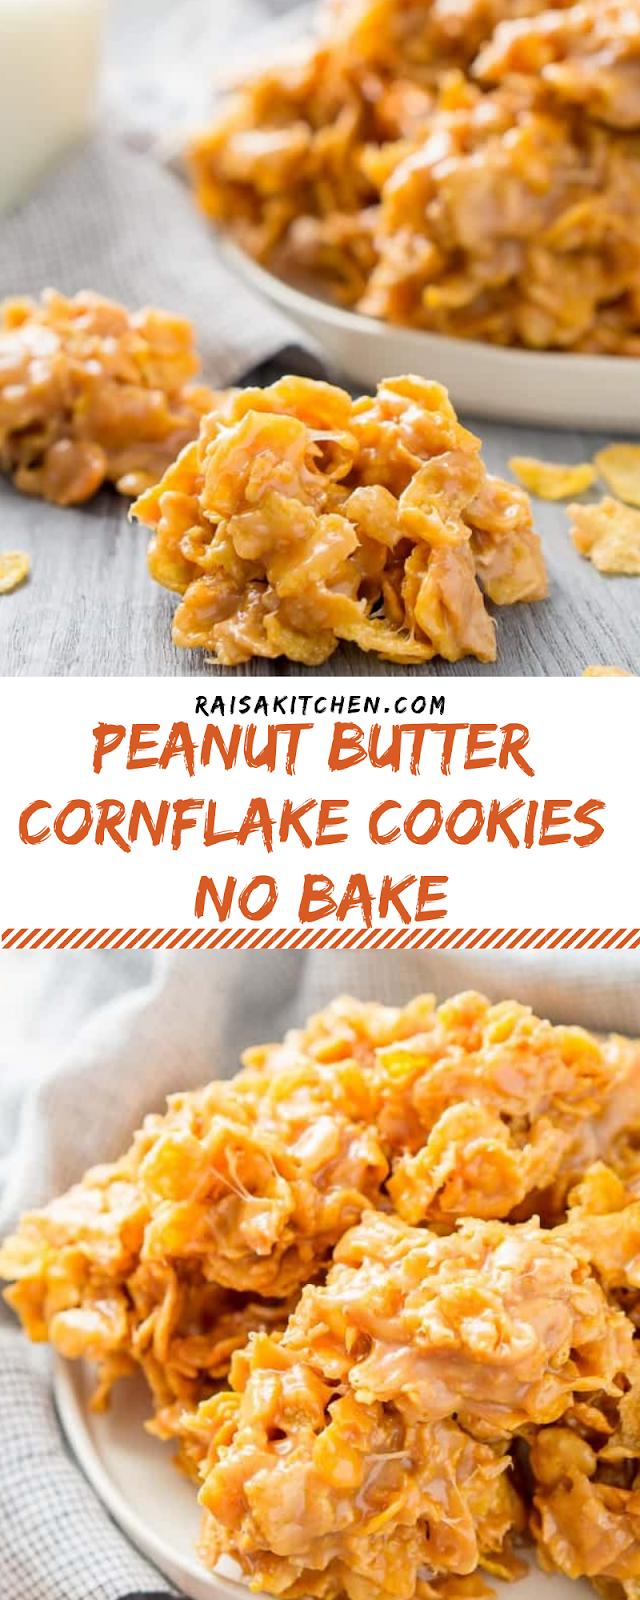 Peanut Butter Cornflake Cookies (no bake)